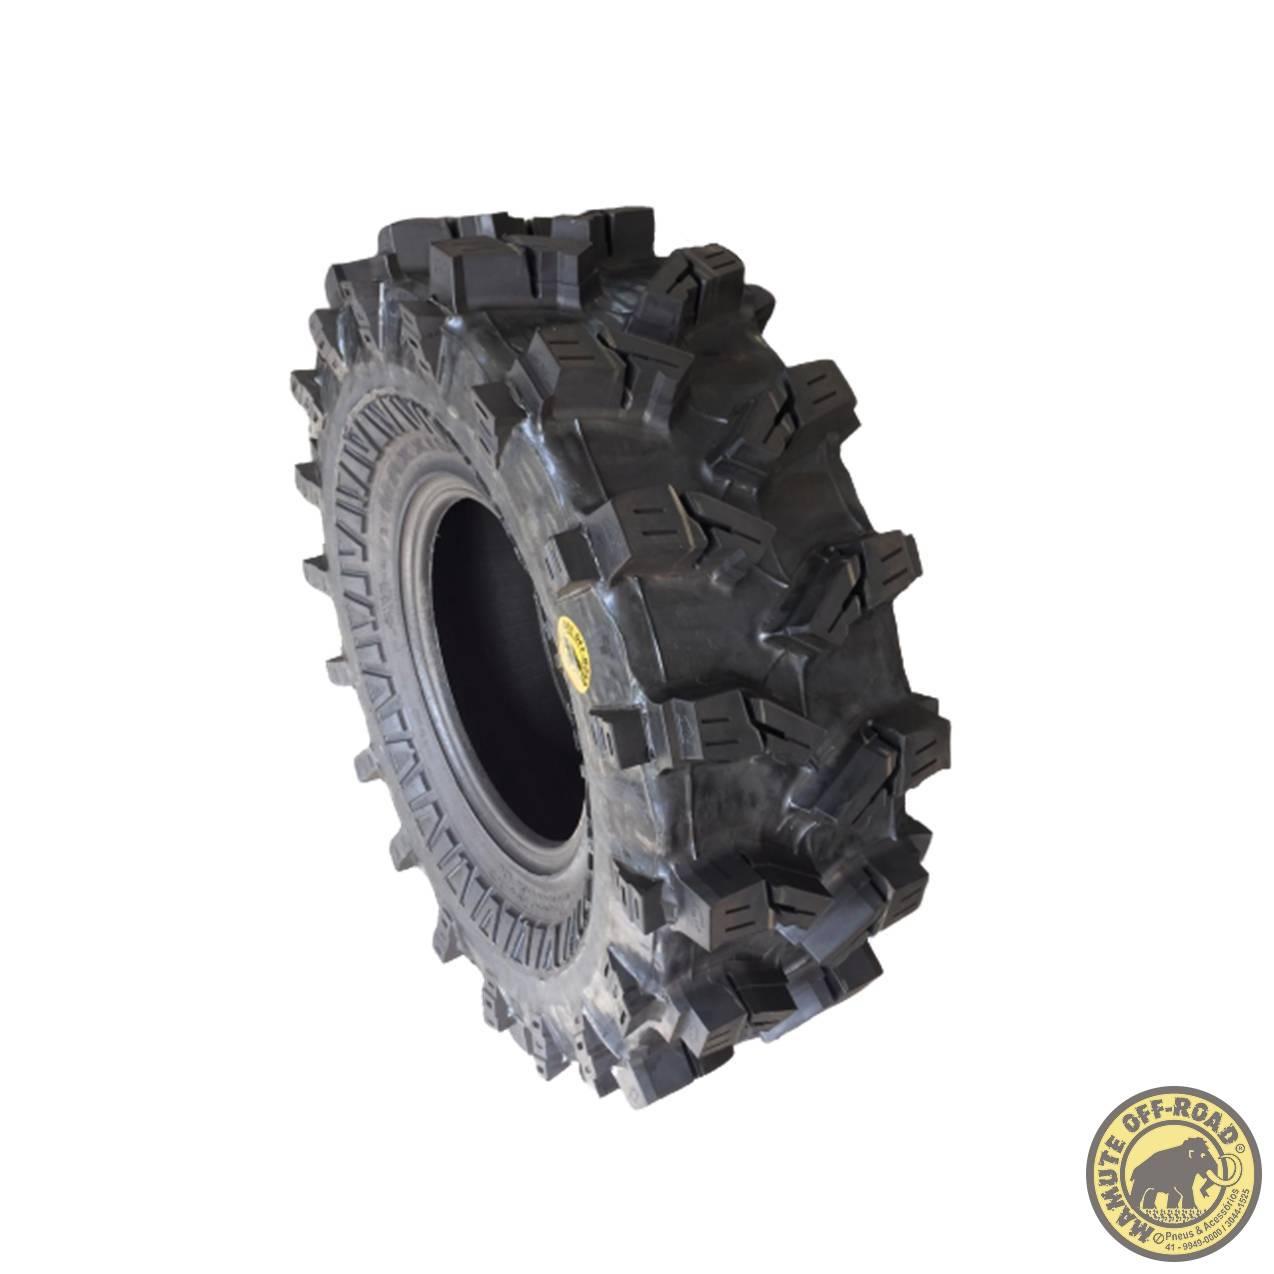 Pneu Super Insano - 315x75 R16